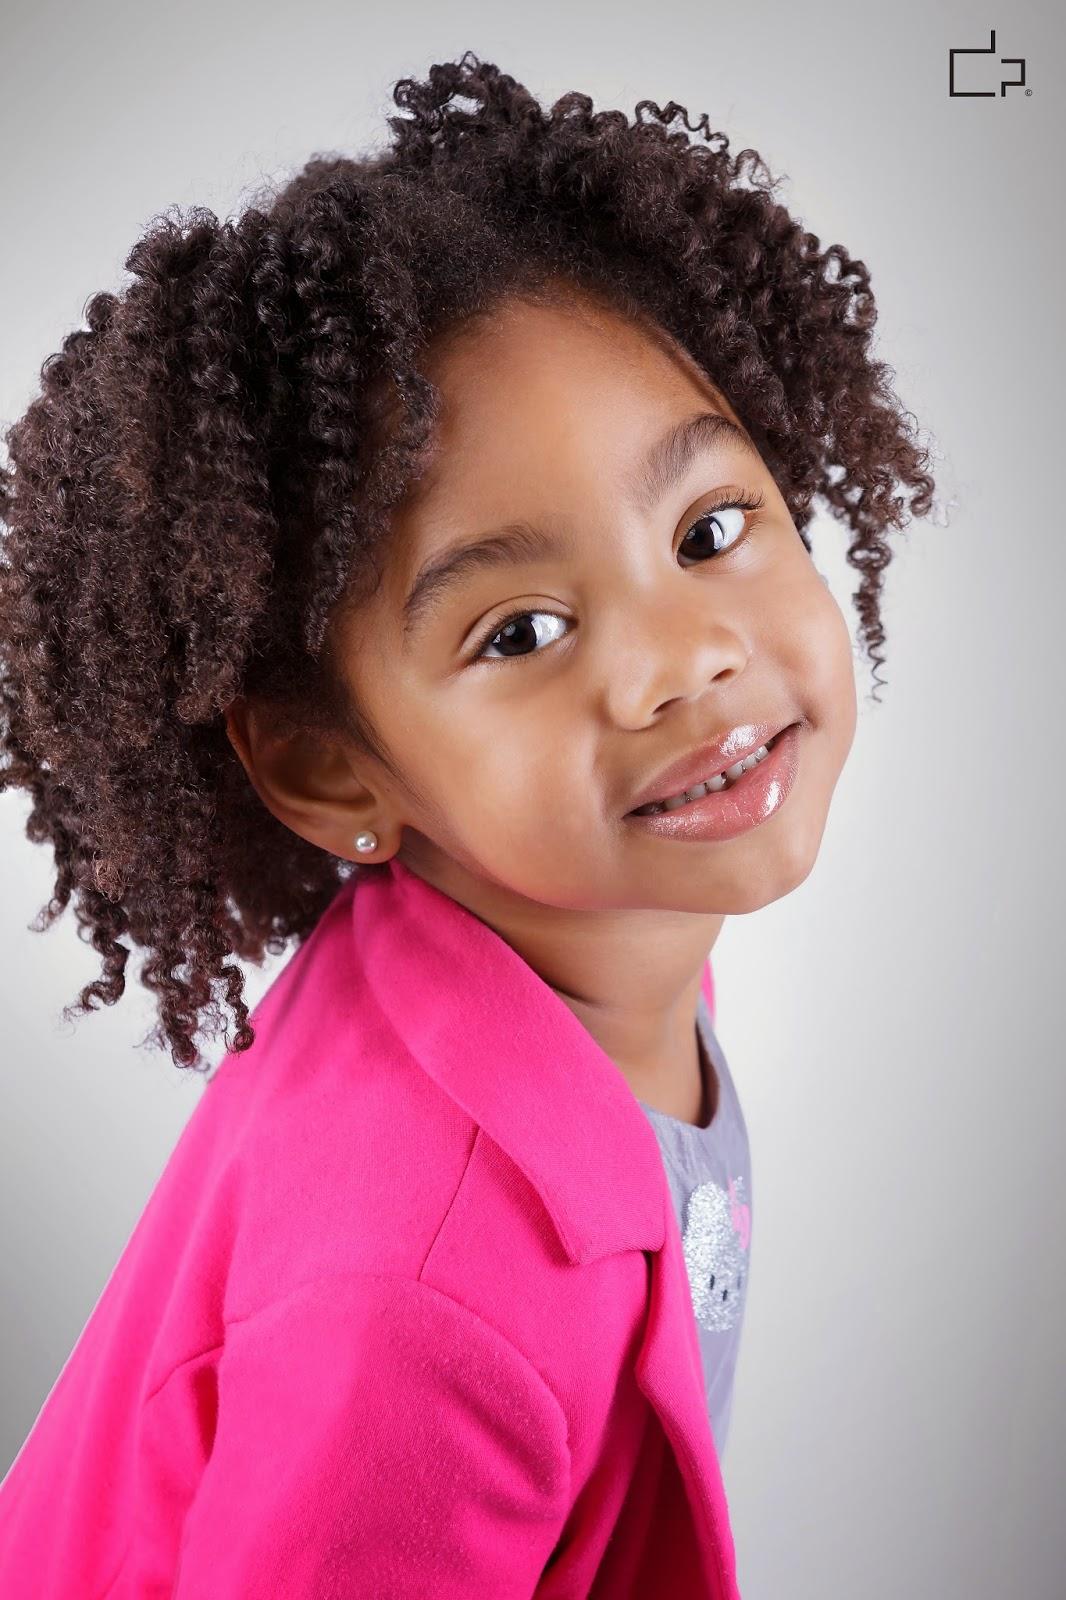 Dora Photography | Roswell GA Kids Photographer